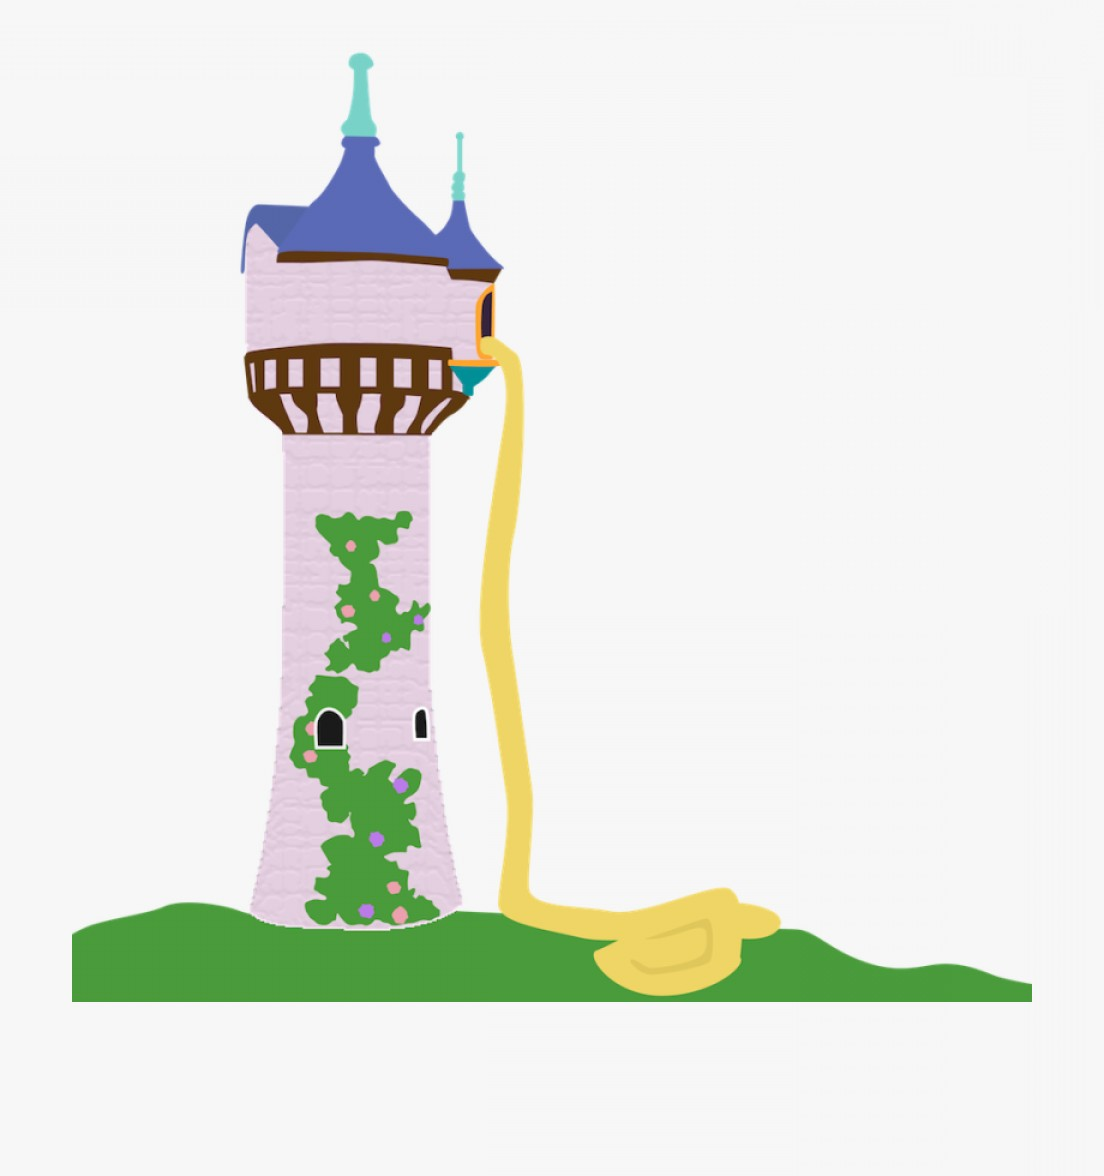 Obxwirapunzel Tower Clipart By Kimberly Rapunzel Tower.